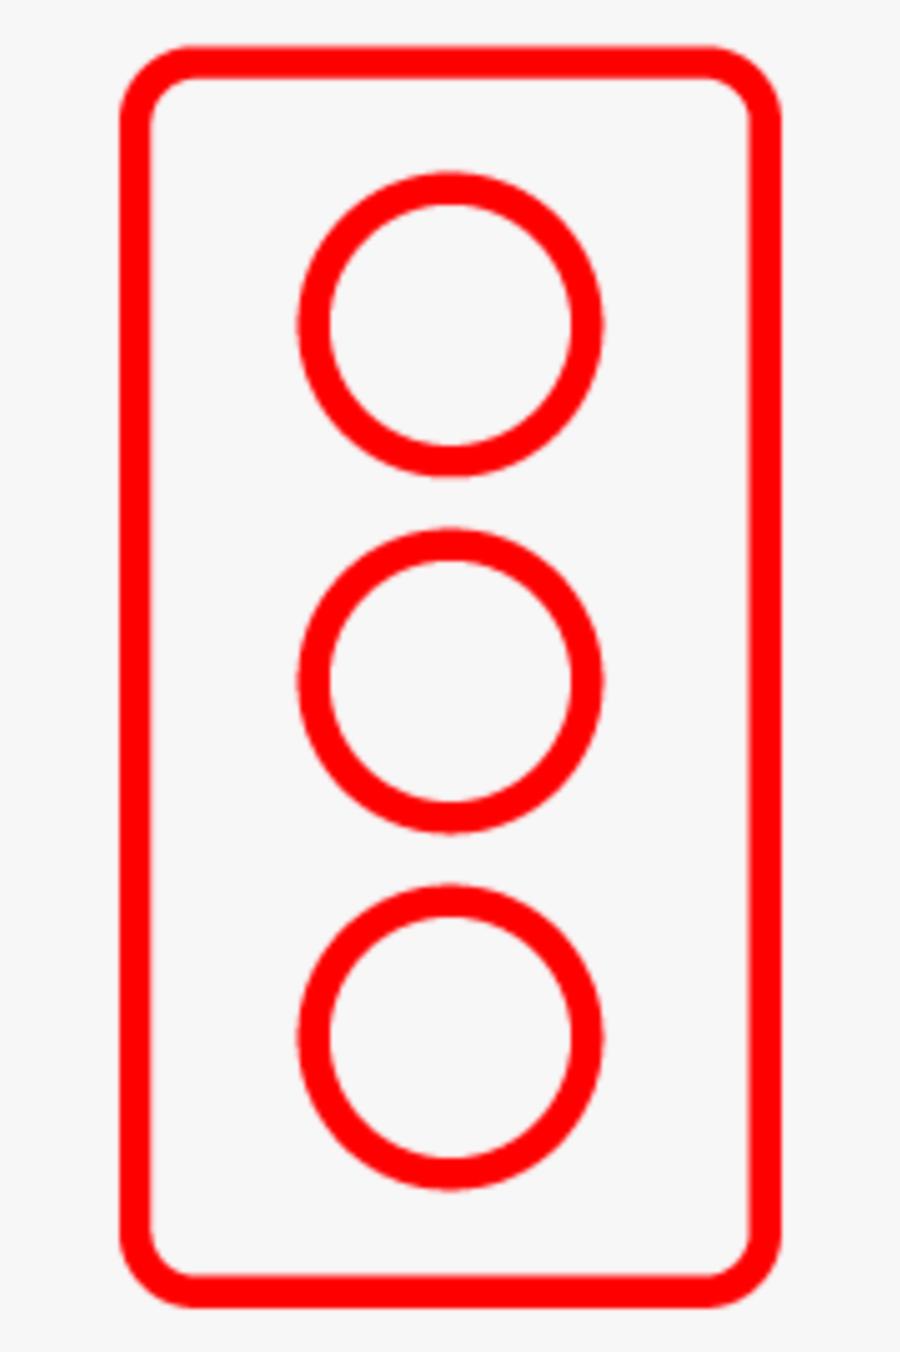 Medium Fern Wird Nah Icon Ampel - Circle, Transparent Clipart